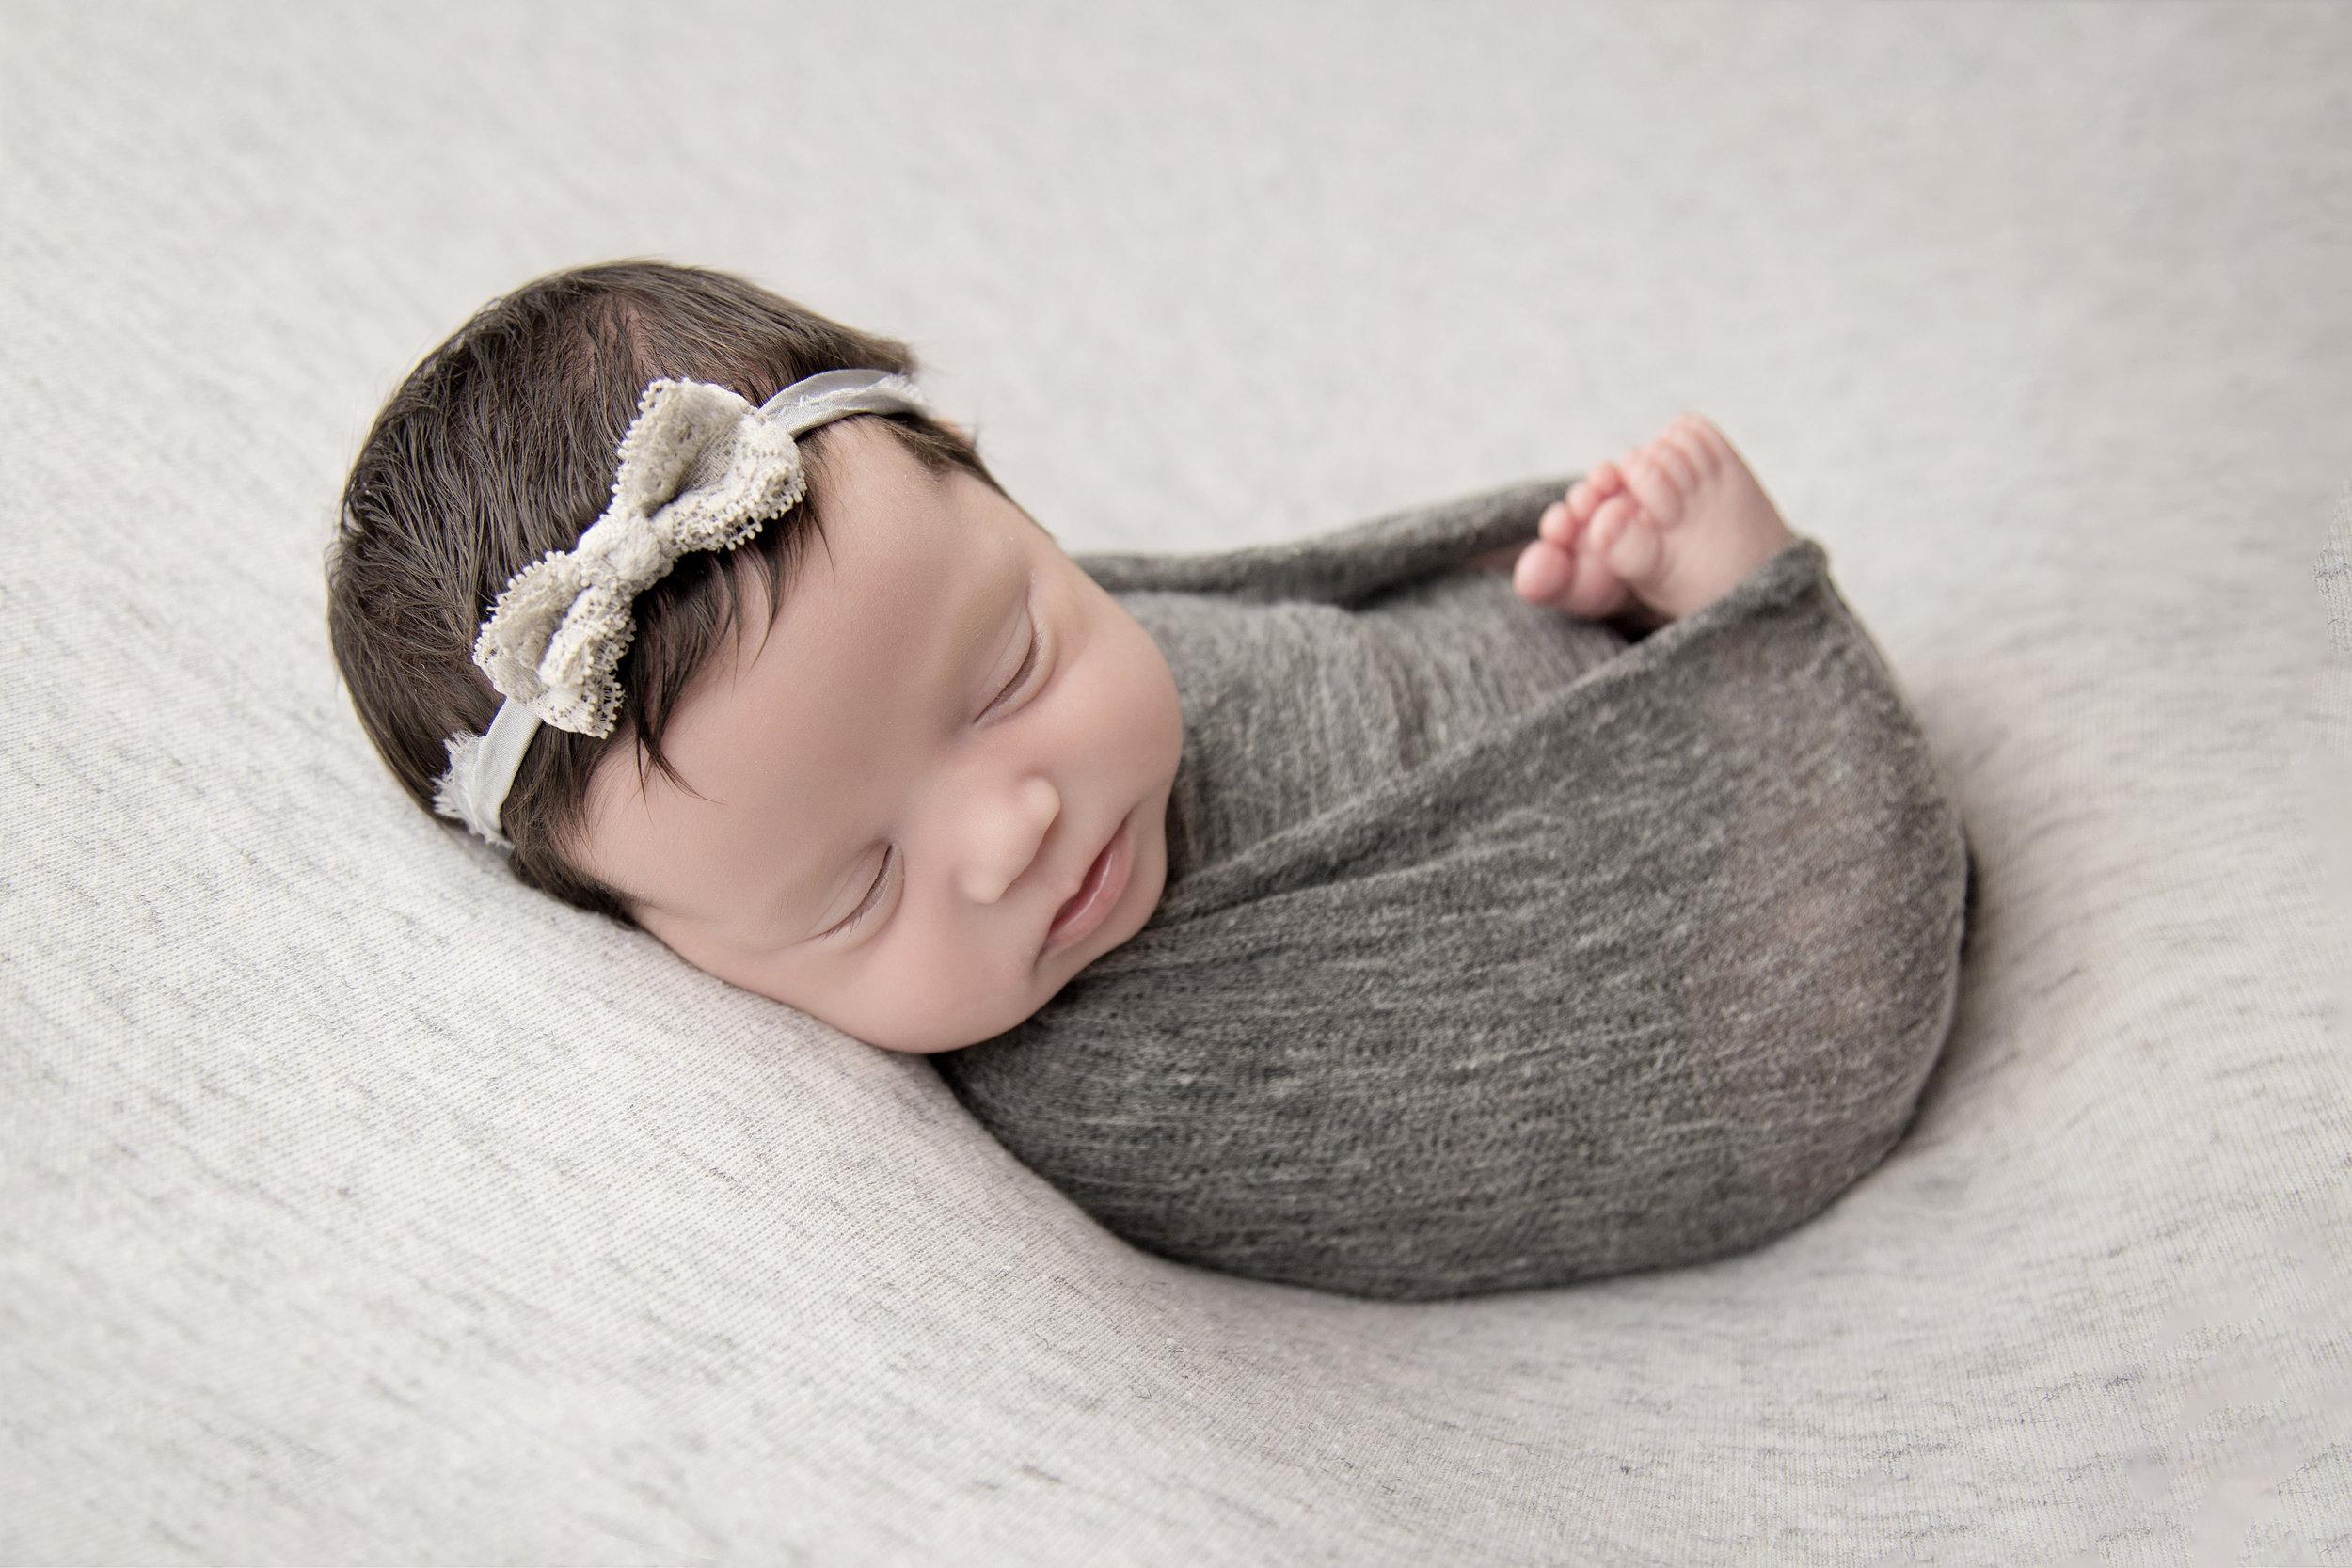 lancaster-newborn-photography-angie-englerth-aep008.jpg